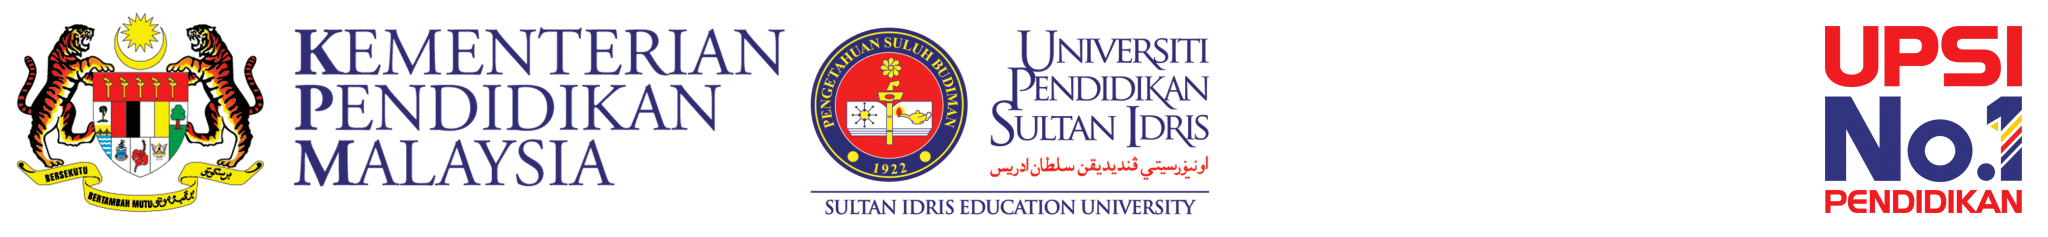 UPSI | Bahagian Komunikasi Korporat